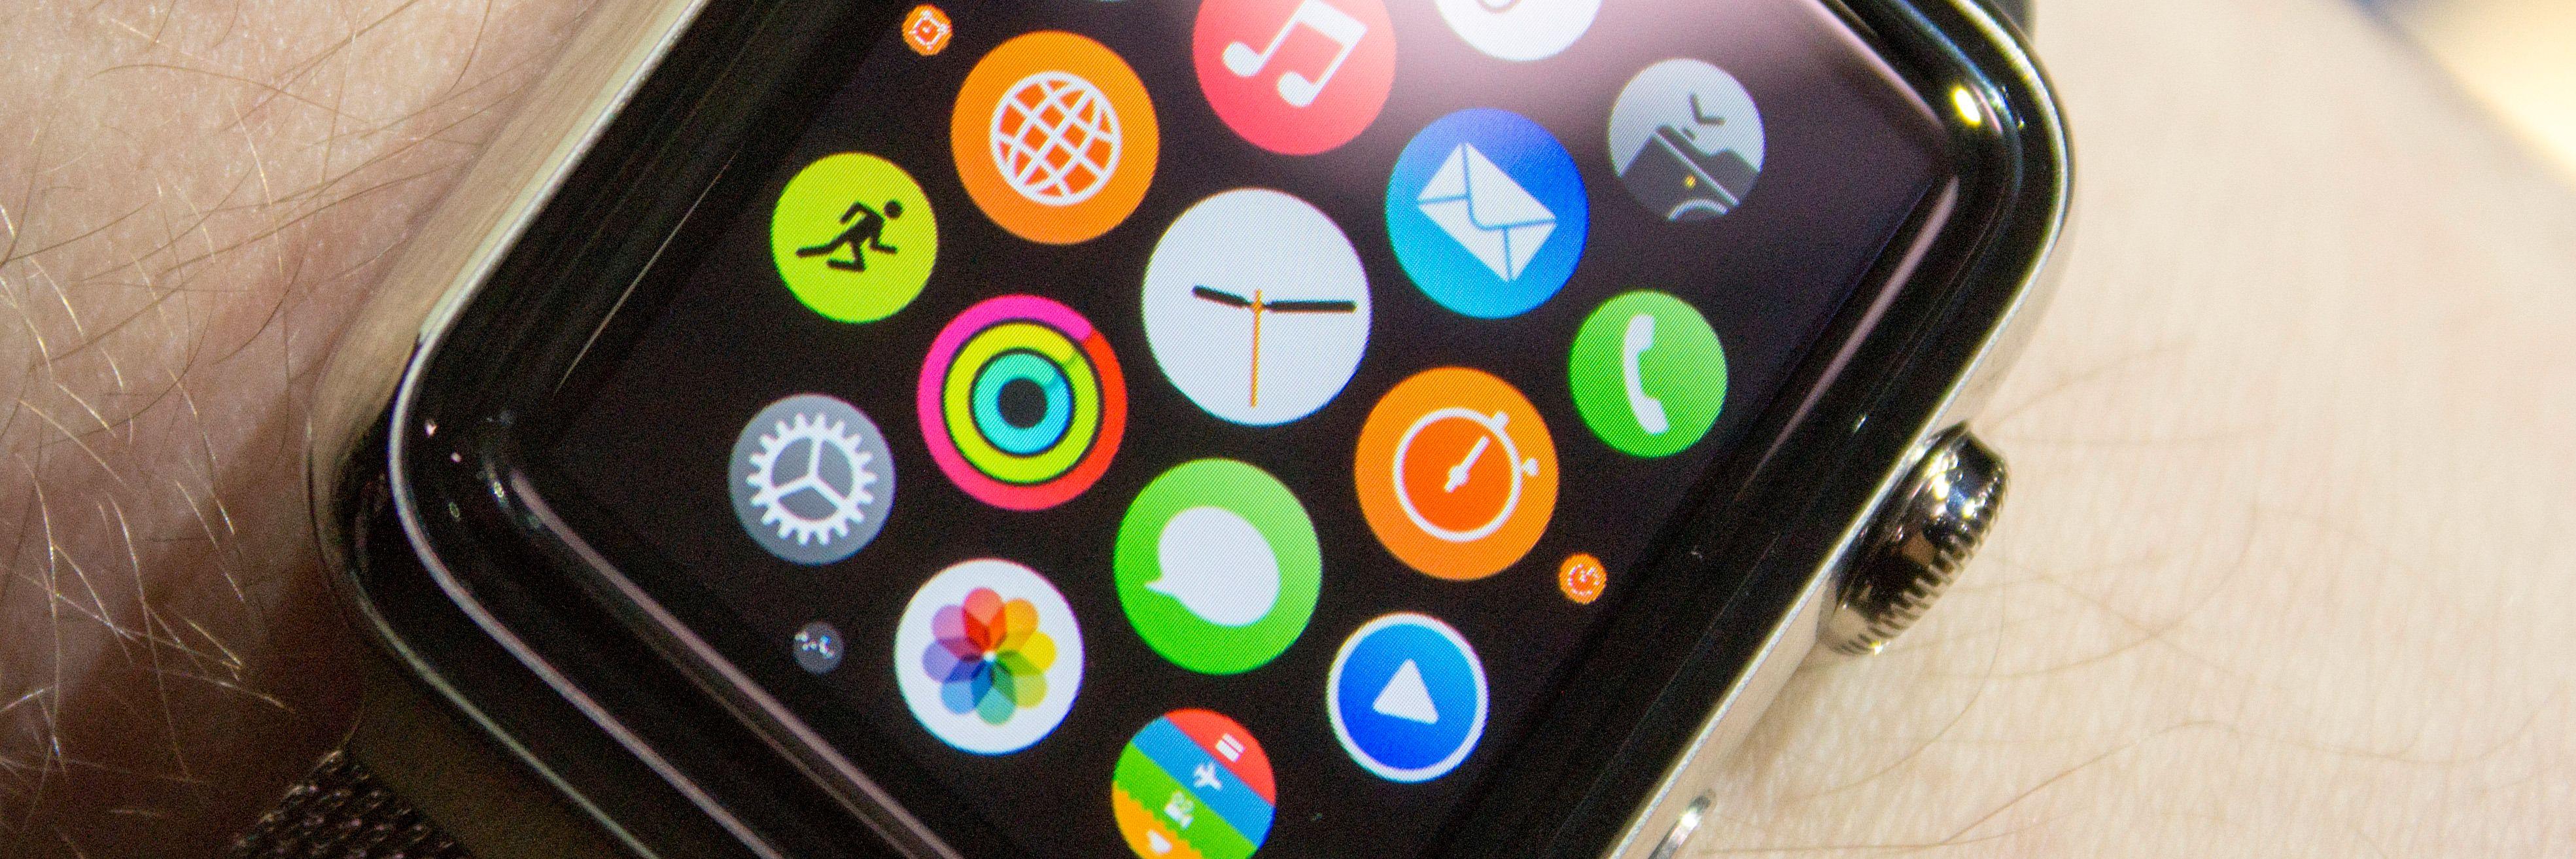 Apple Watch har Force Touch - får nye iPhone det samme? Foto: Finn Jarle Kvalheim, Tek.no